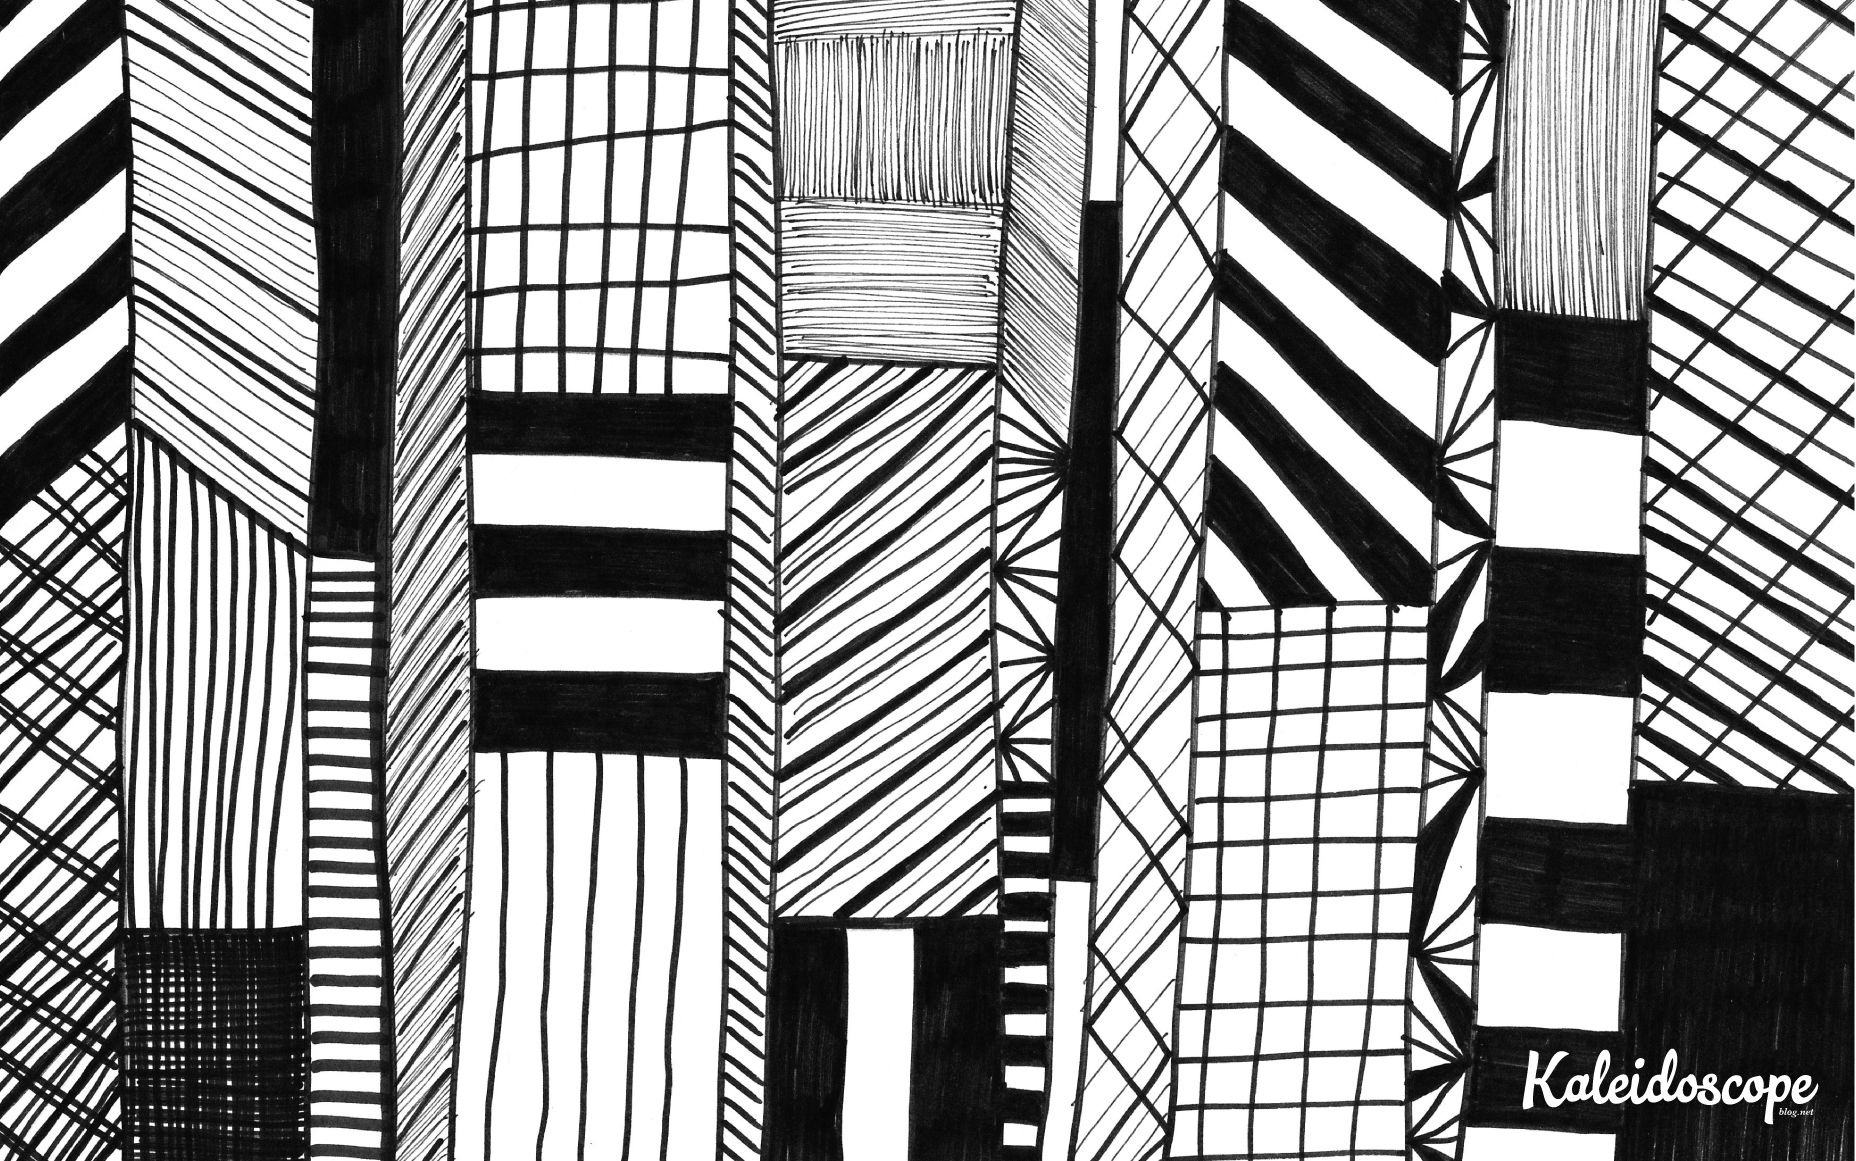 Black and white hand drawn geometric pattern computer